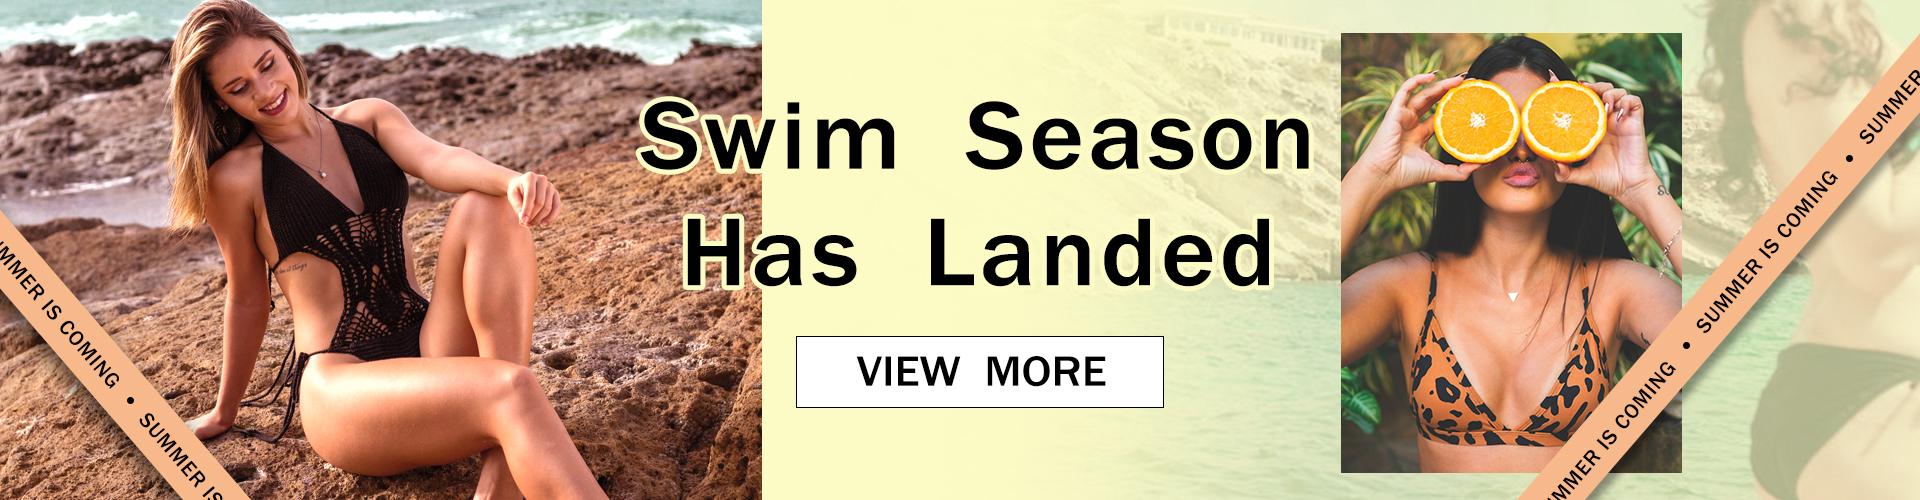 swim season has landed